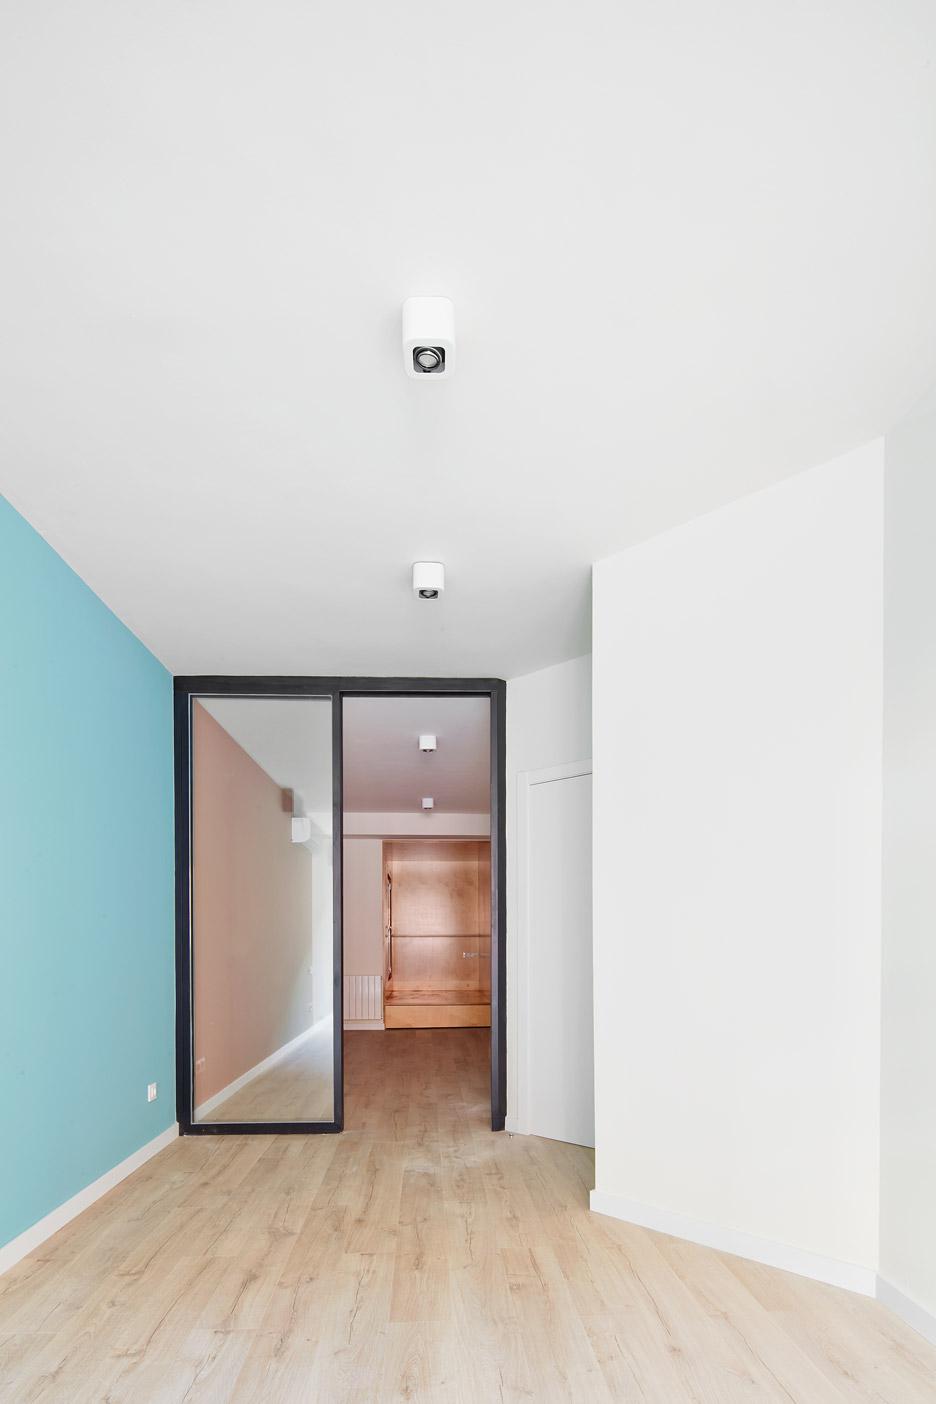 architecture_ open_layout__design_studia_interiors_osnovadesign_osnova_poltava_08